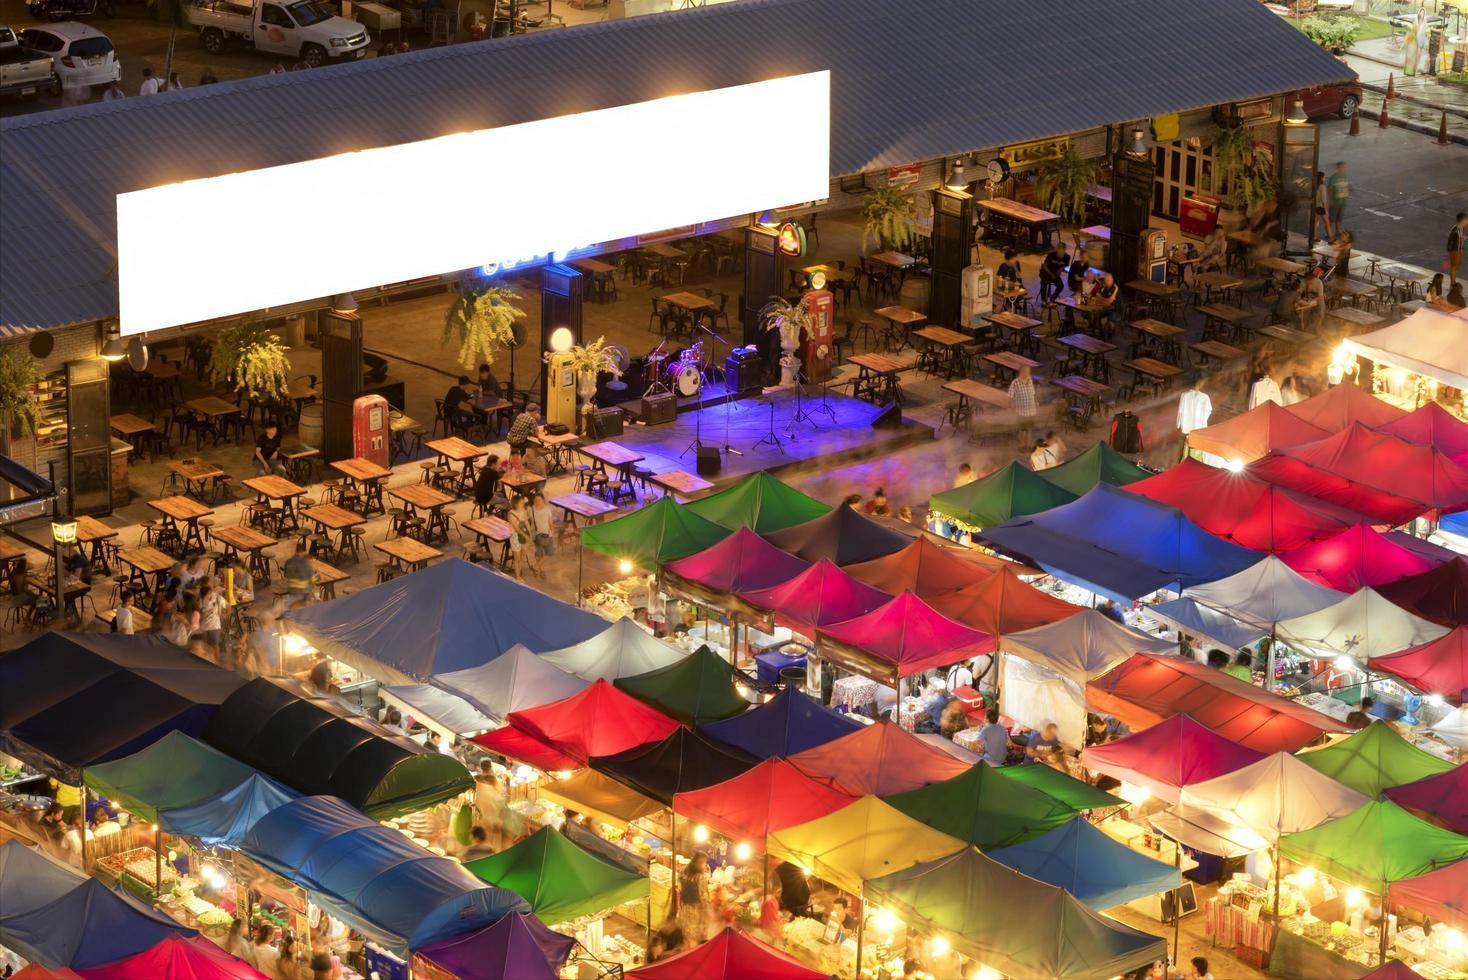 kleurrijke tenten en bar in ratchada avondmarkt foto